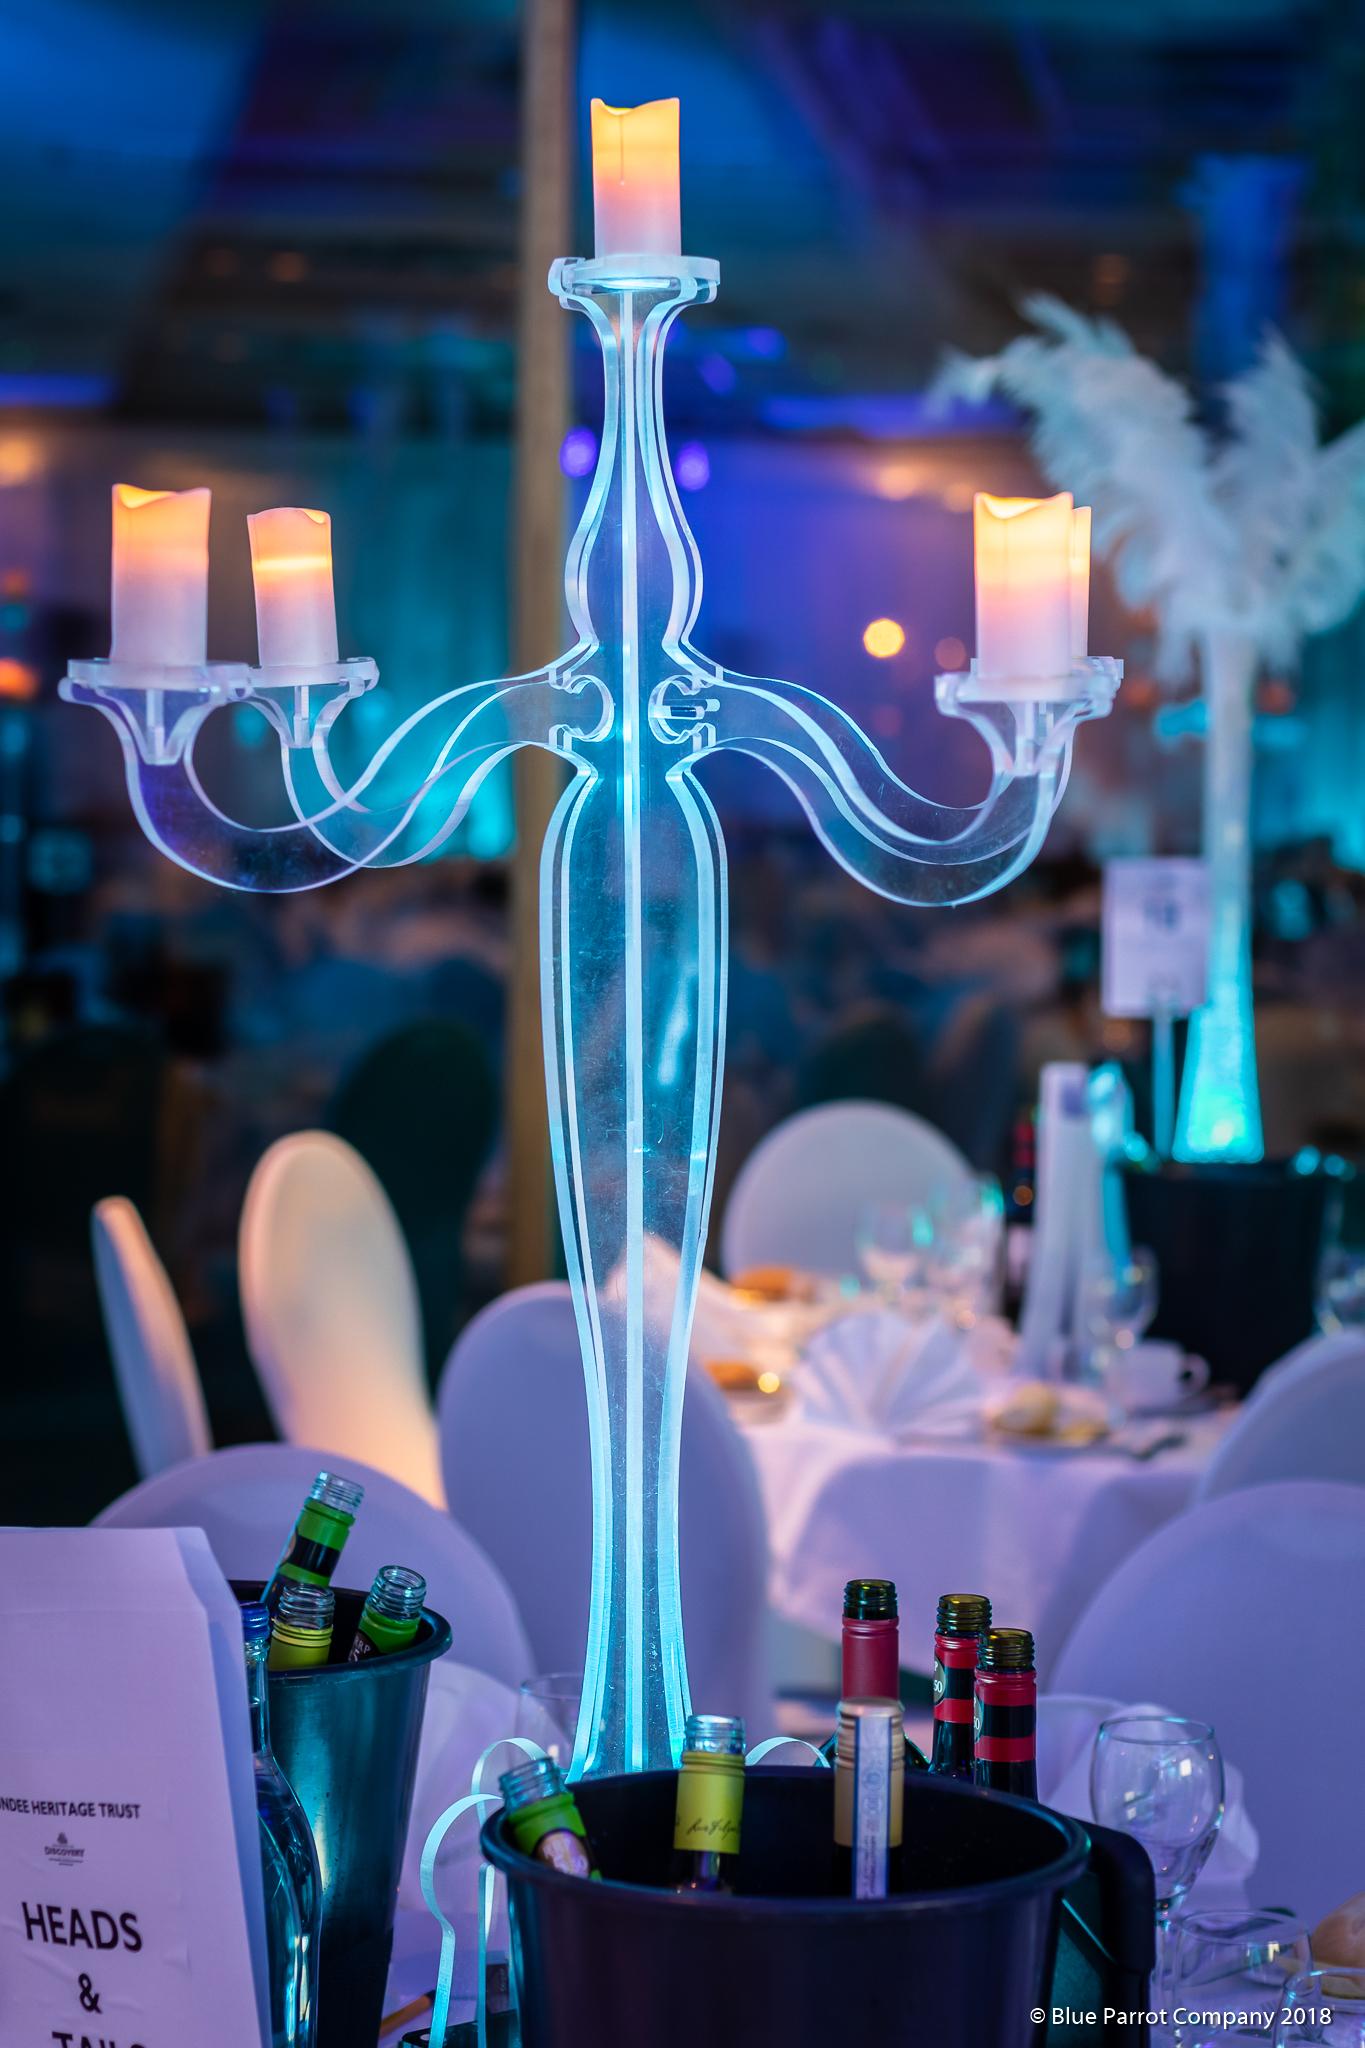 2018-11-16 01-271 Acrylic candelabra table centre.jpg